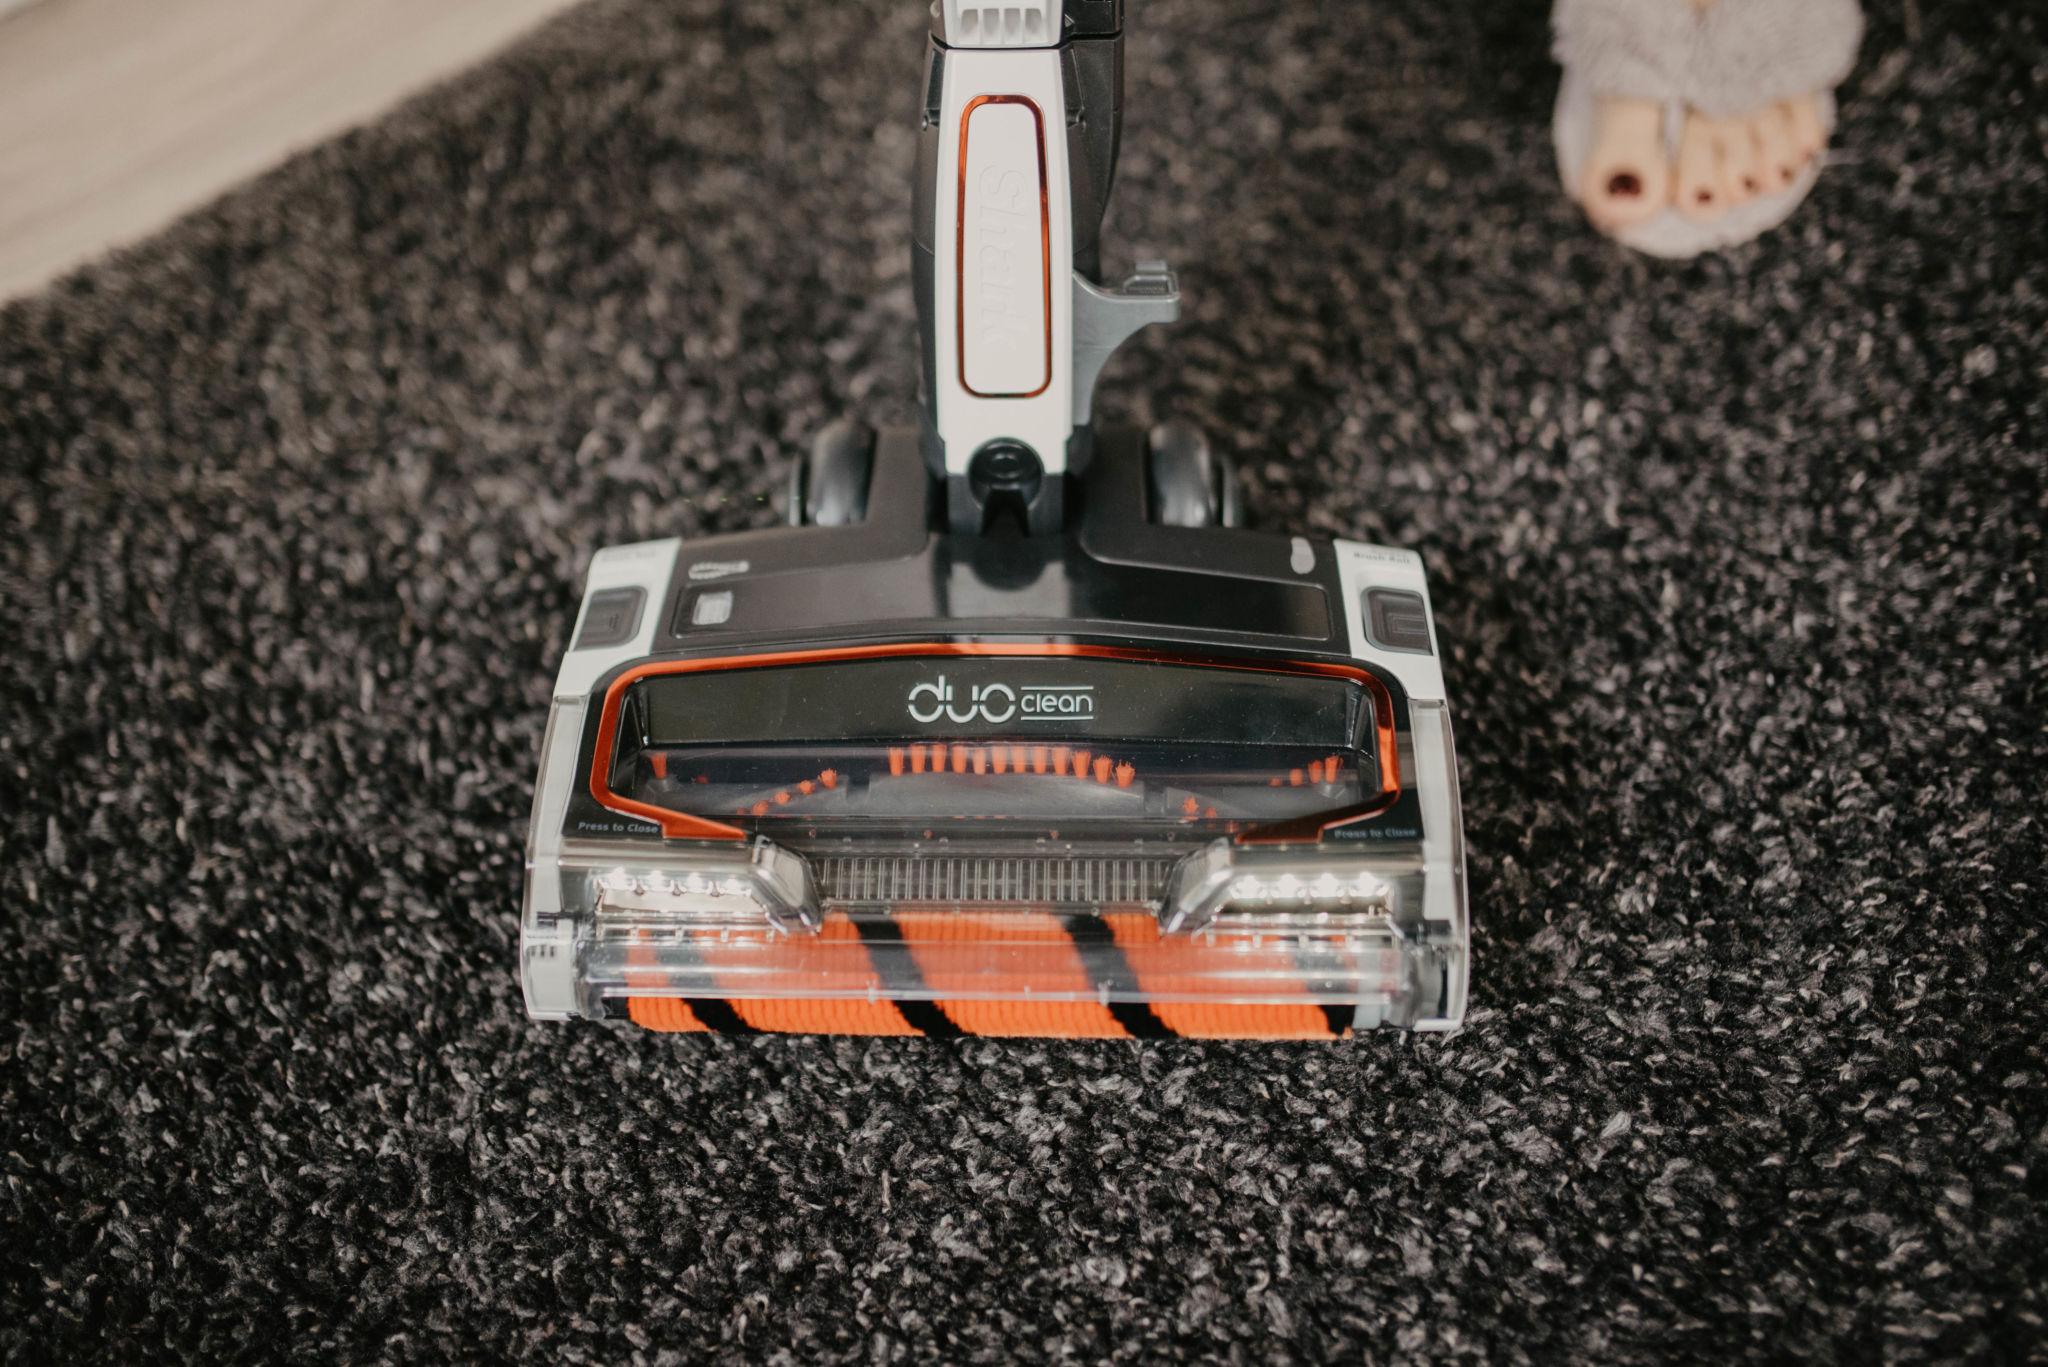 Shark Cordless Vacuum Duo Clean Review